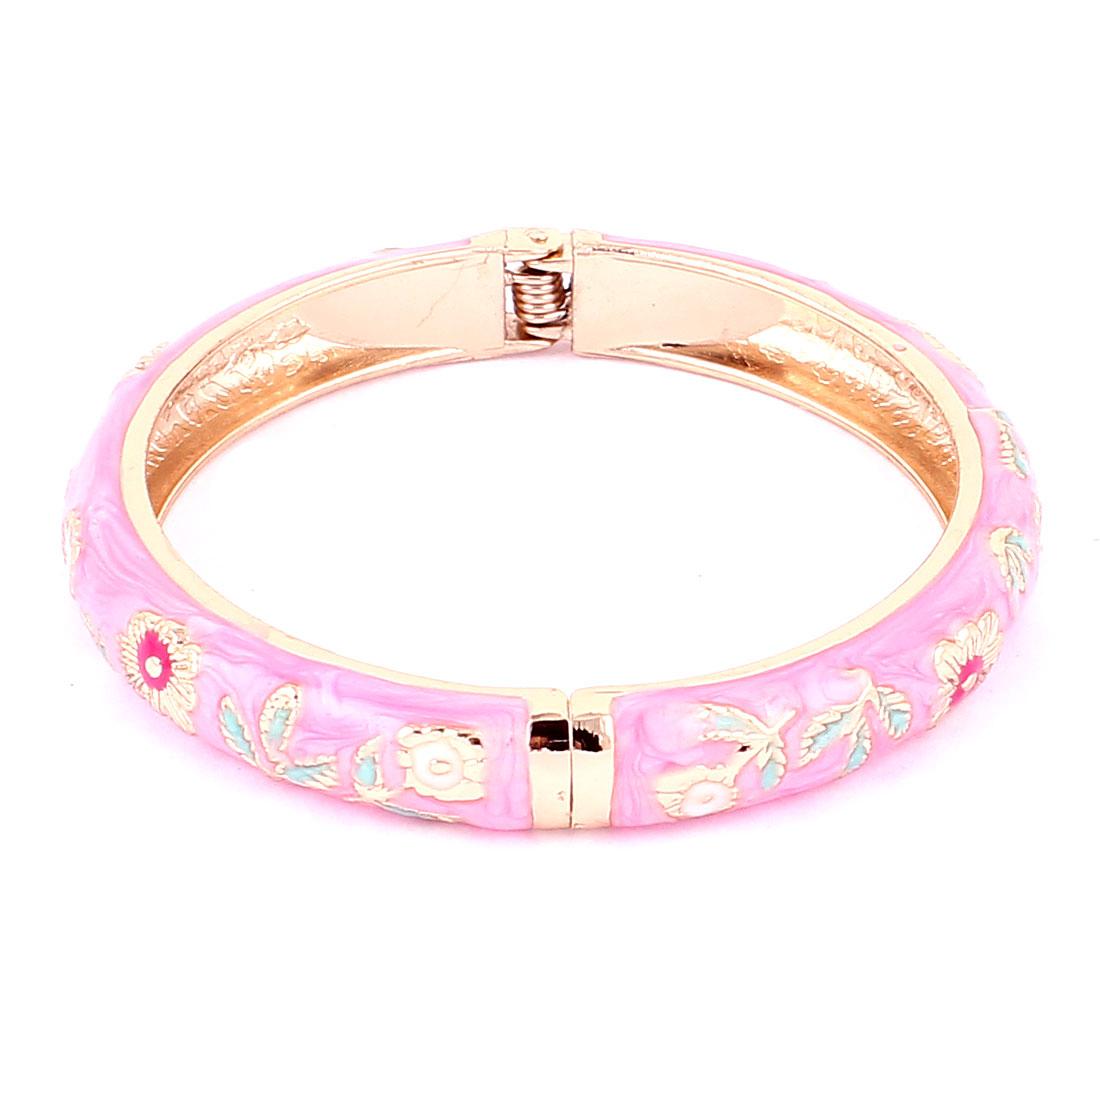 Women Gold Plated Spring Hinge Cuff Enamel Bangle Bracelet Jewelry Gift Pink